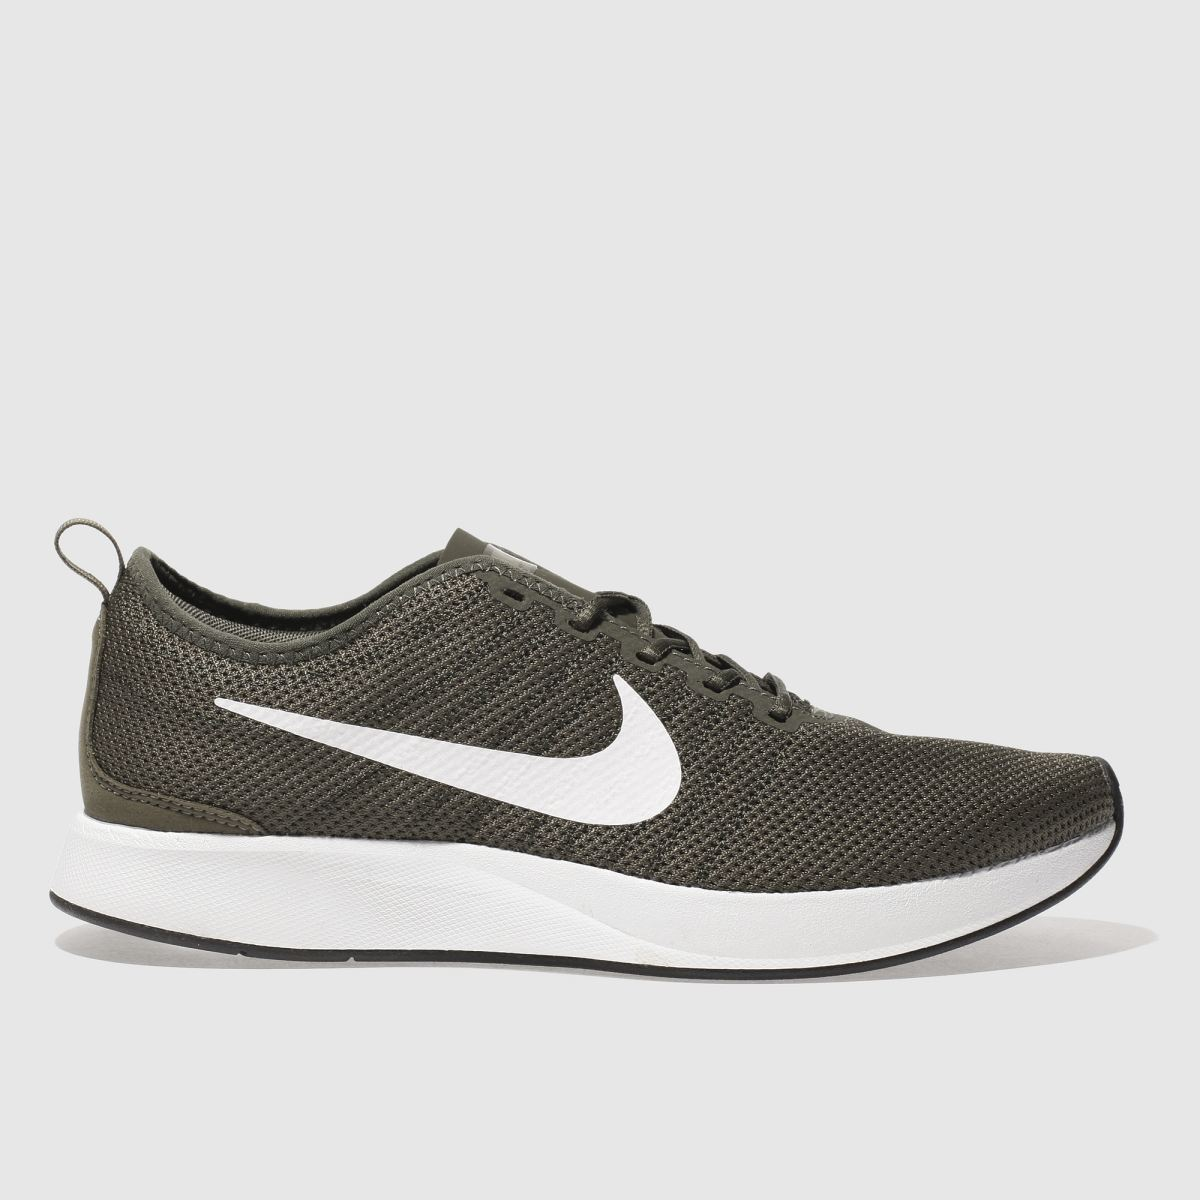 Nike Khaki Dualtone Trainers